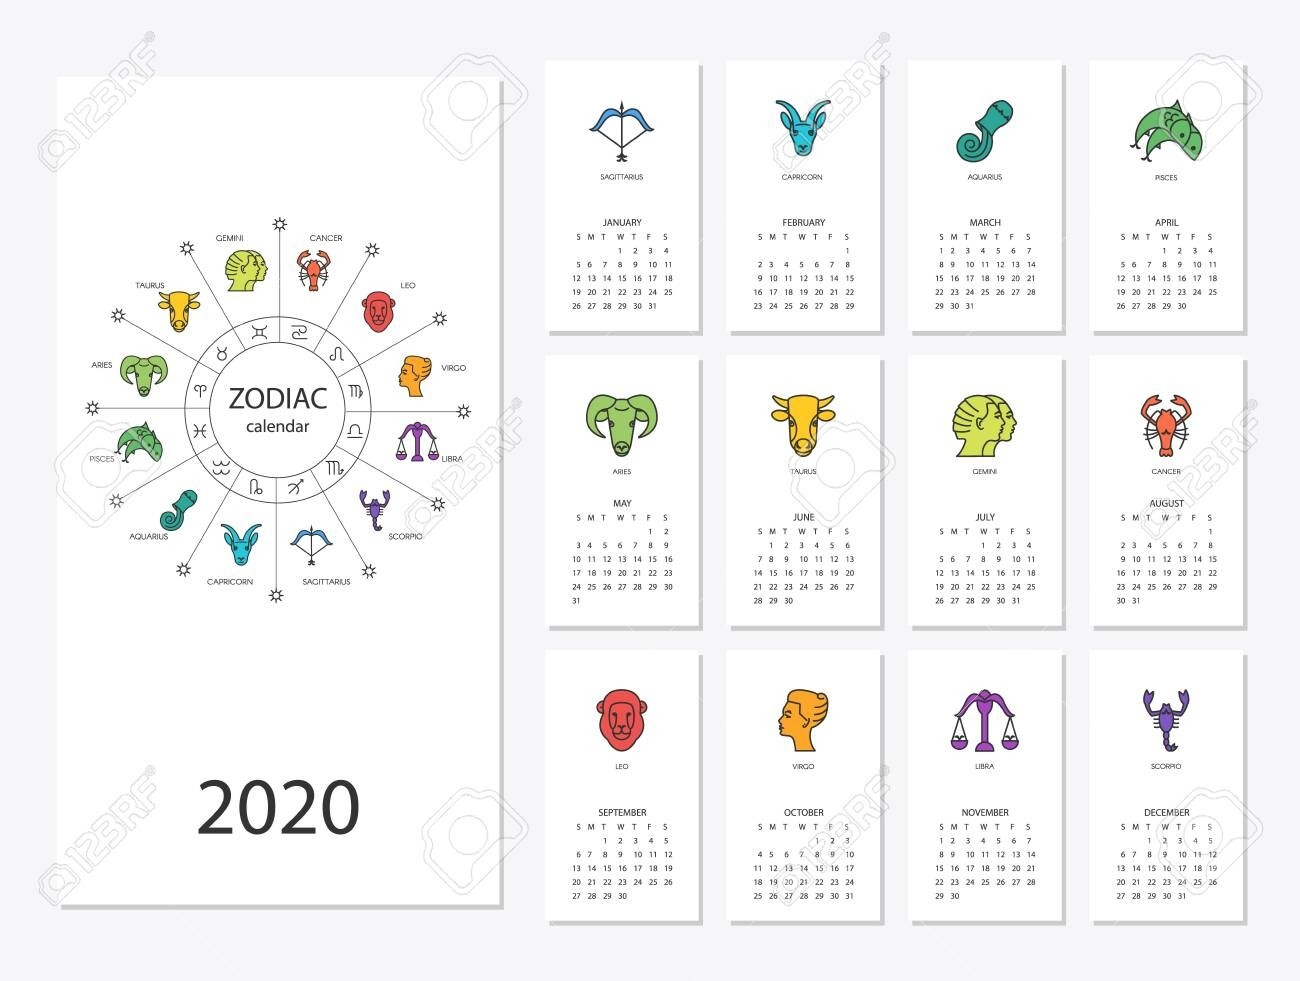 Calendar 2020 With Horoscope Signs Zodiac Symbols Set  2020 Calendar With Zodiac Signs